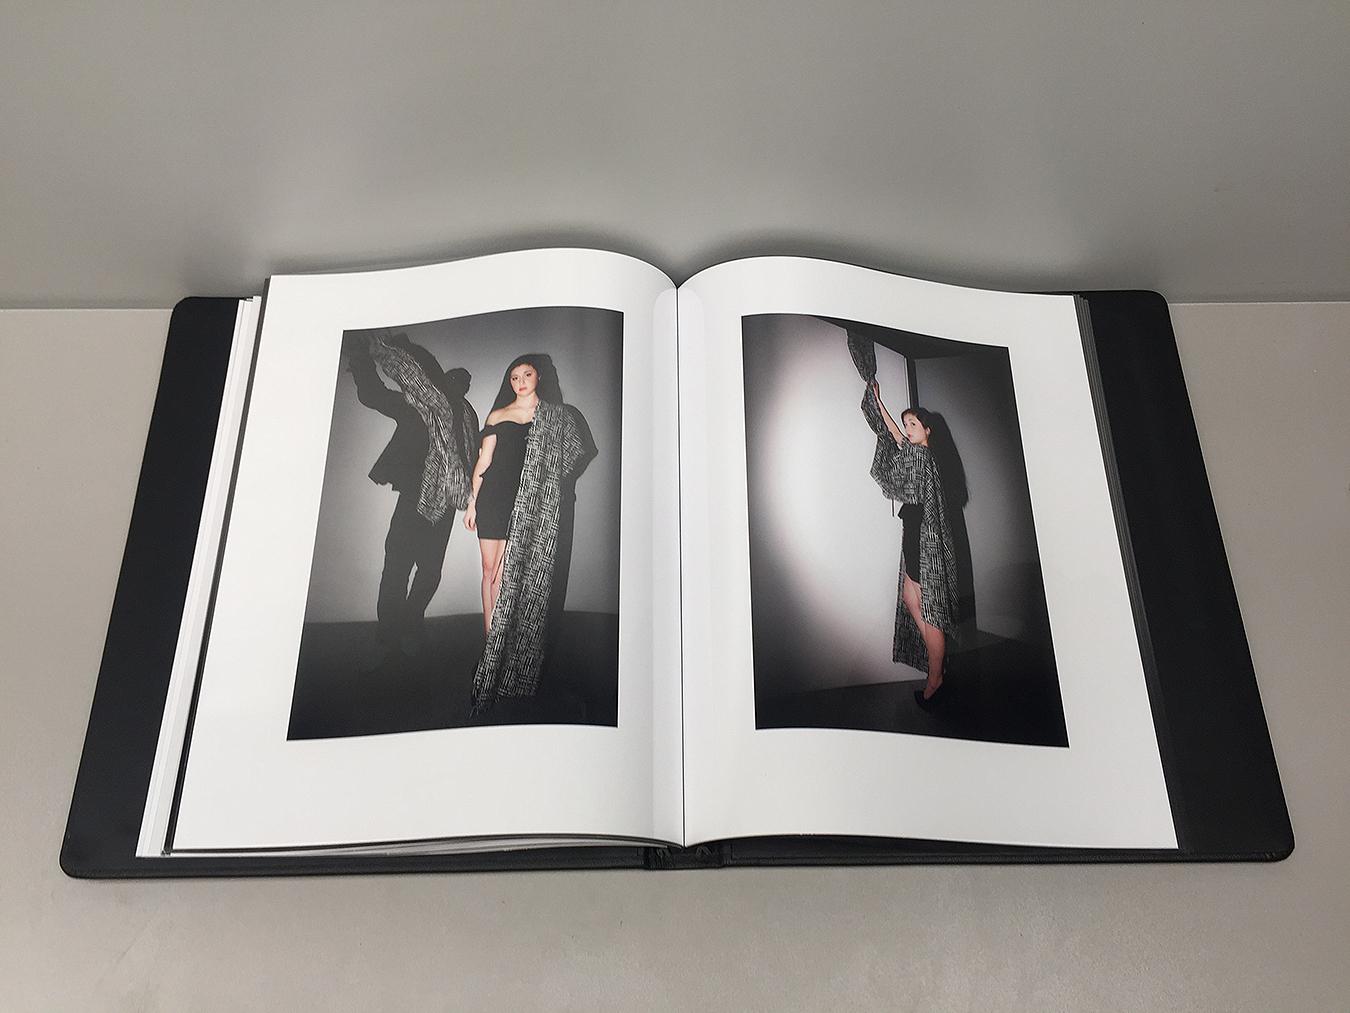 Tony_Ward_Studio_portfolio_presentations_fashion_class_student_Ruoyang_Ni_Nudes_lesbian_love_asian_women_erotica_Upenn_branding_main_line_models